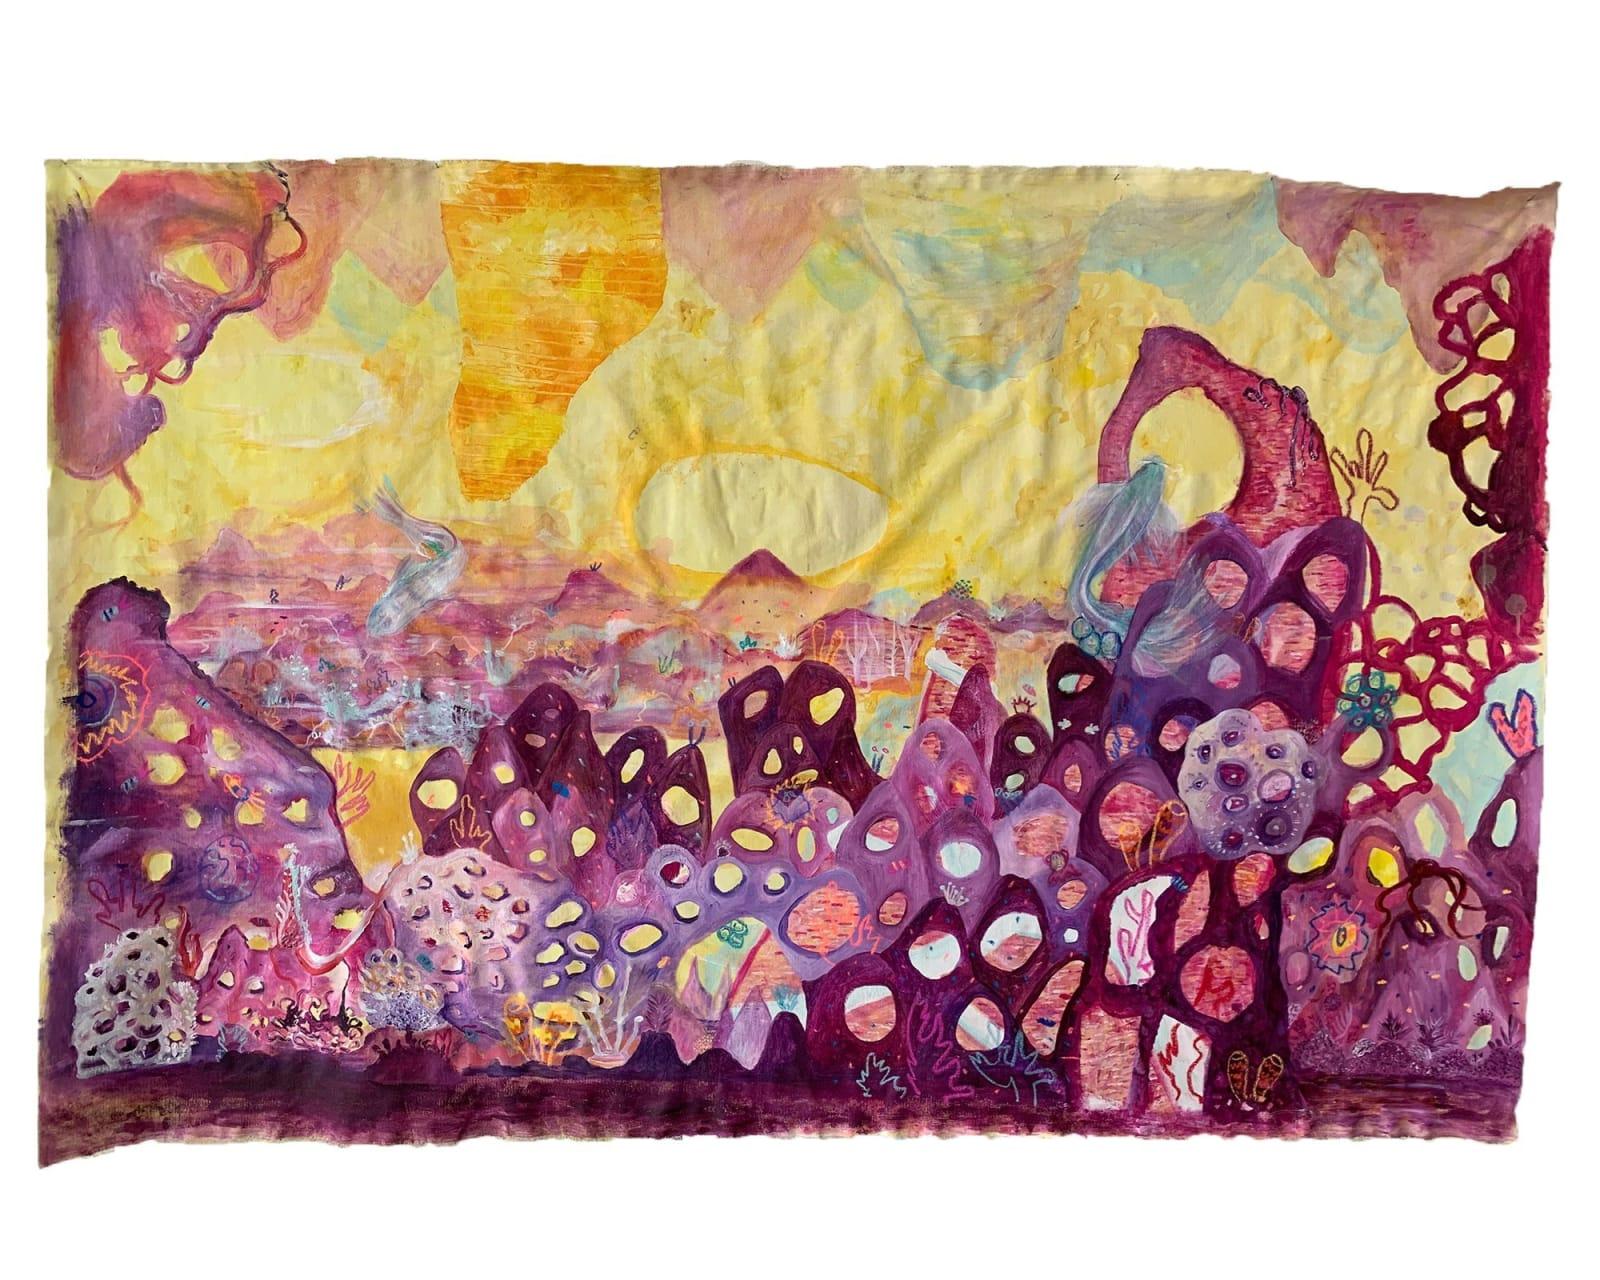 Beatriz Chachamovits & Khotan Fernandez. Dyadic Dynamics, 2020. Acrylic and pastel on canvas. 52 x 79 in,